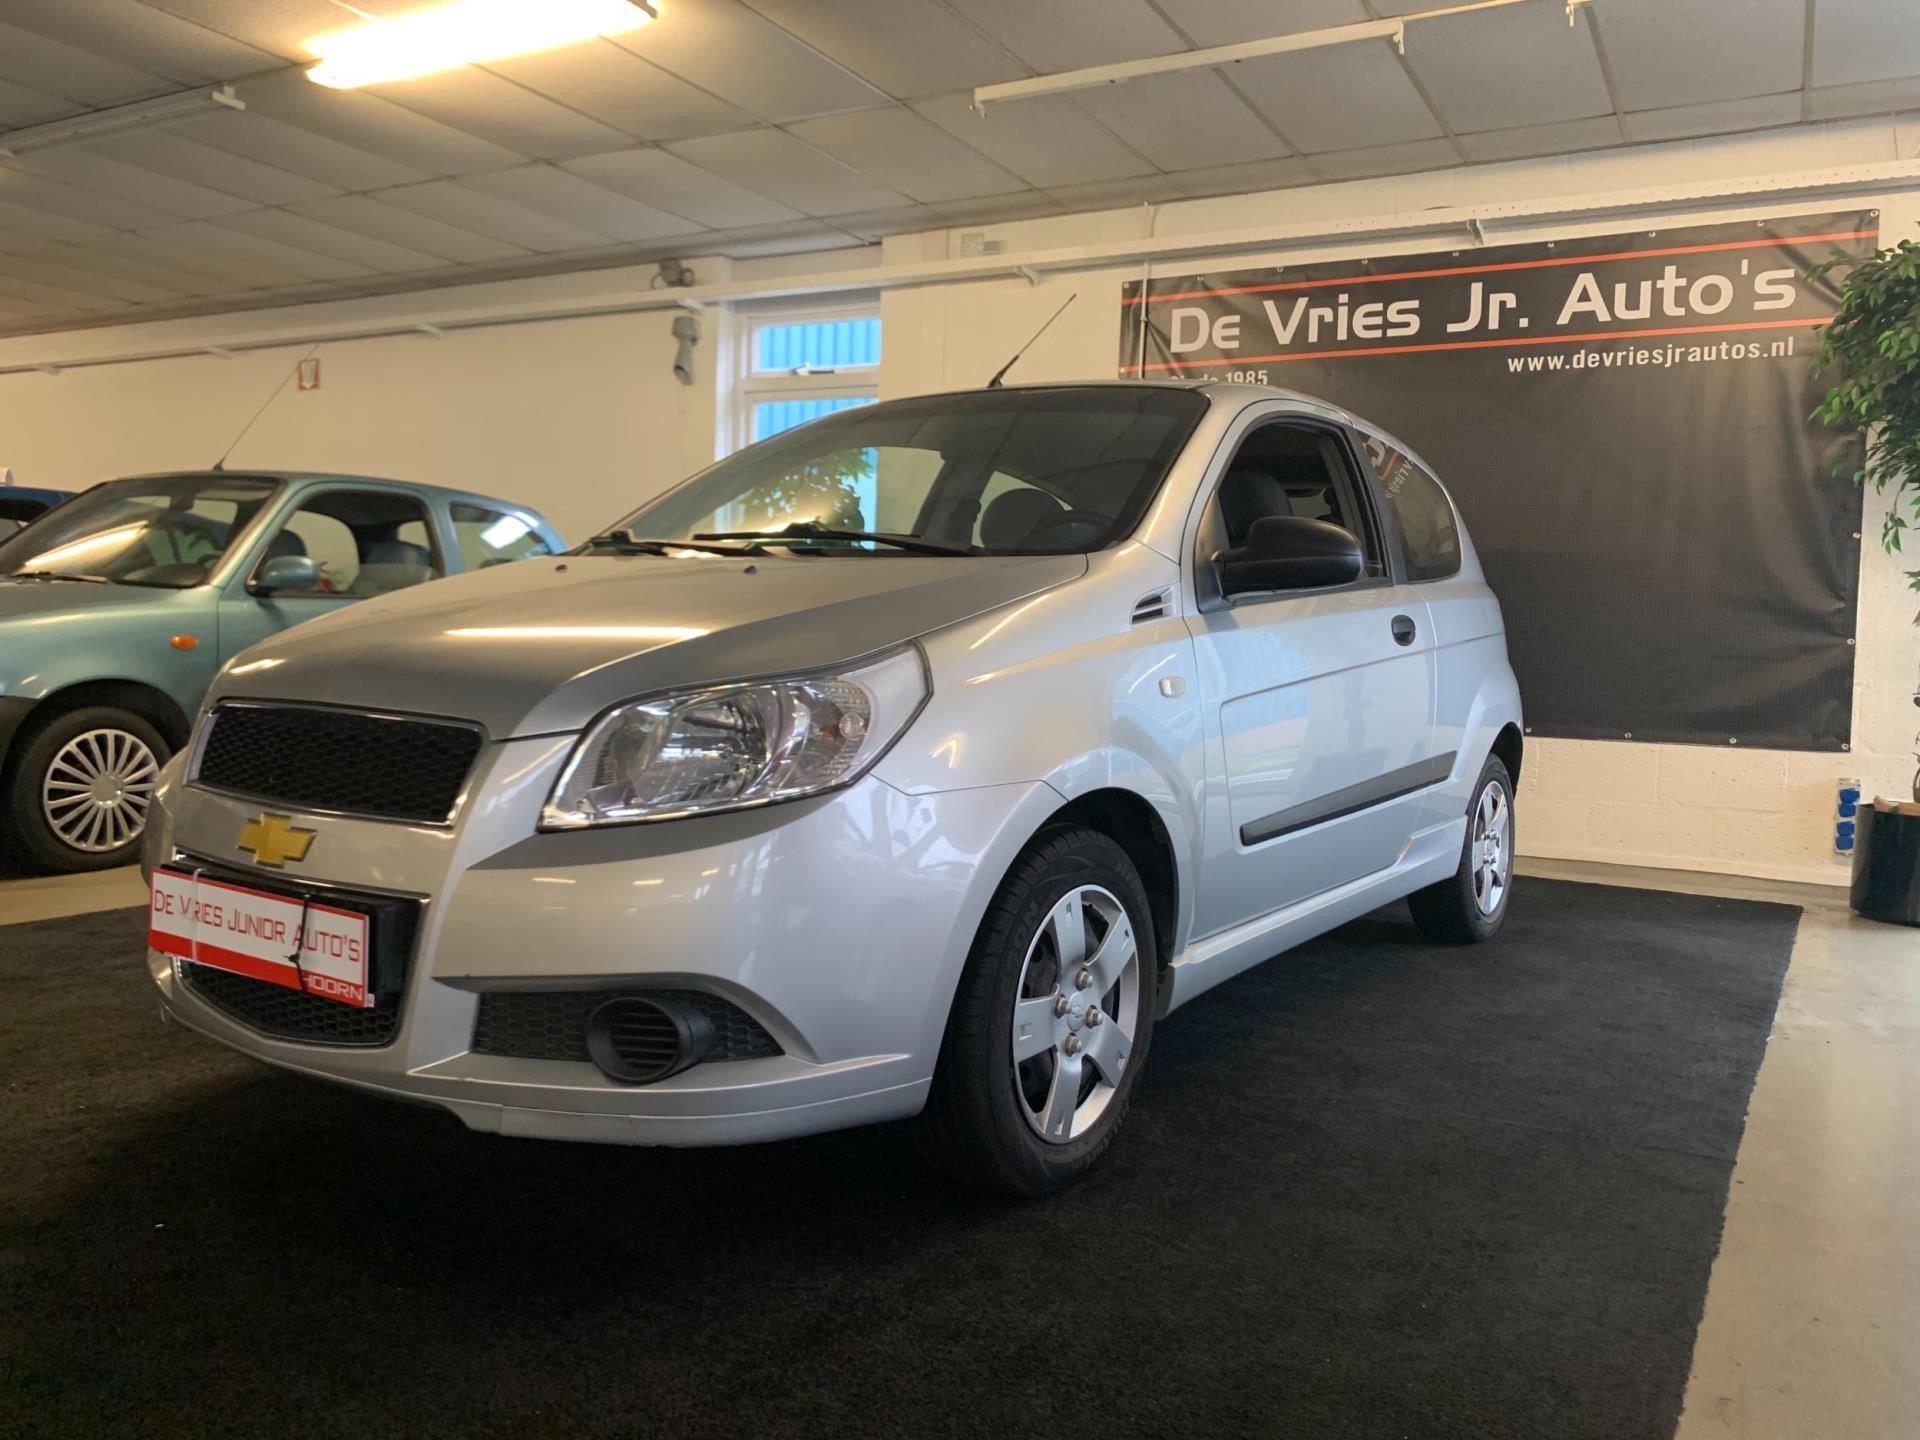 Chevrolet Aveo occasion - De Vries Junior Auto's